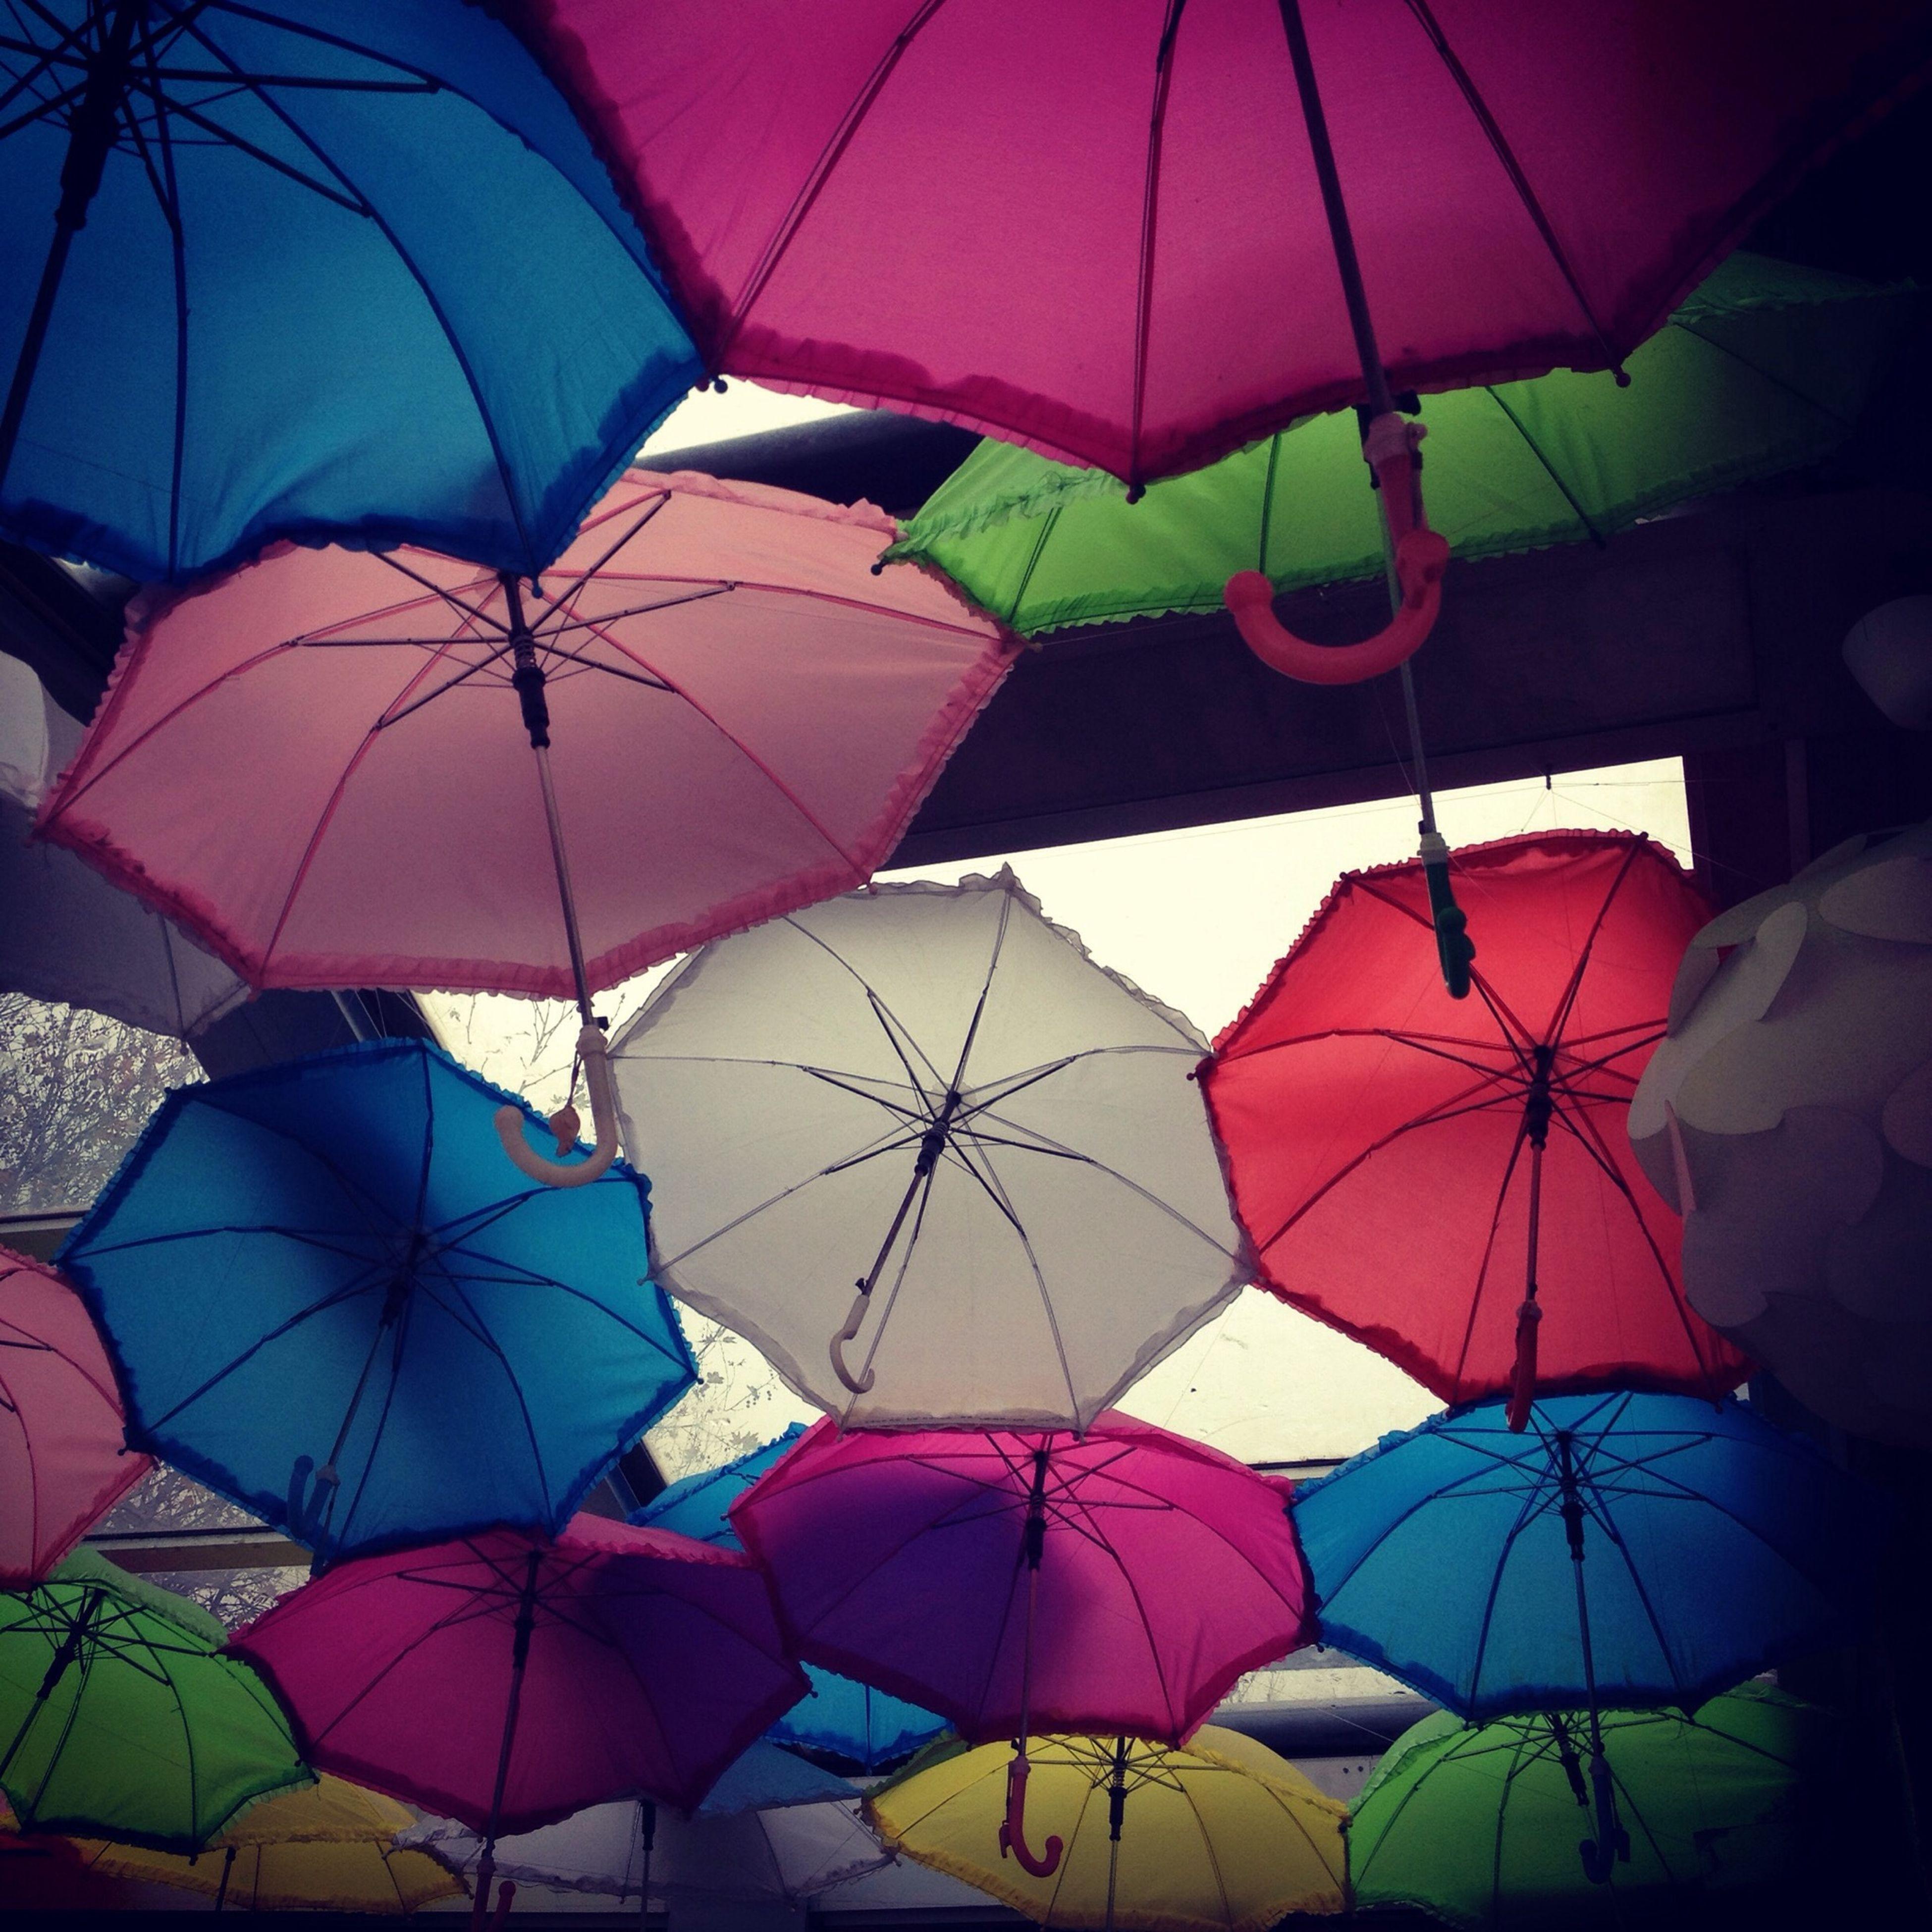 Istanbul Turkey Hello World umbrella